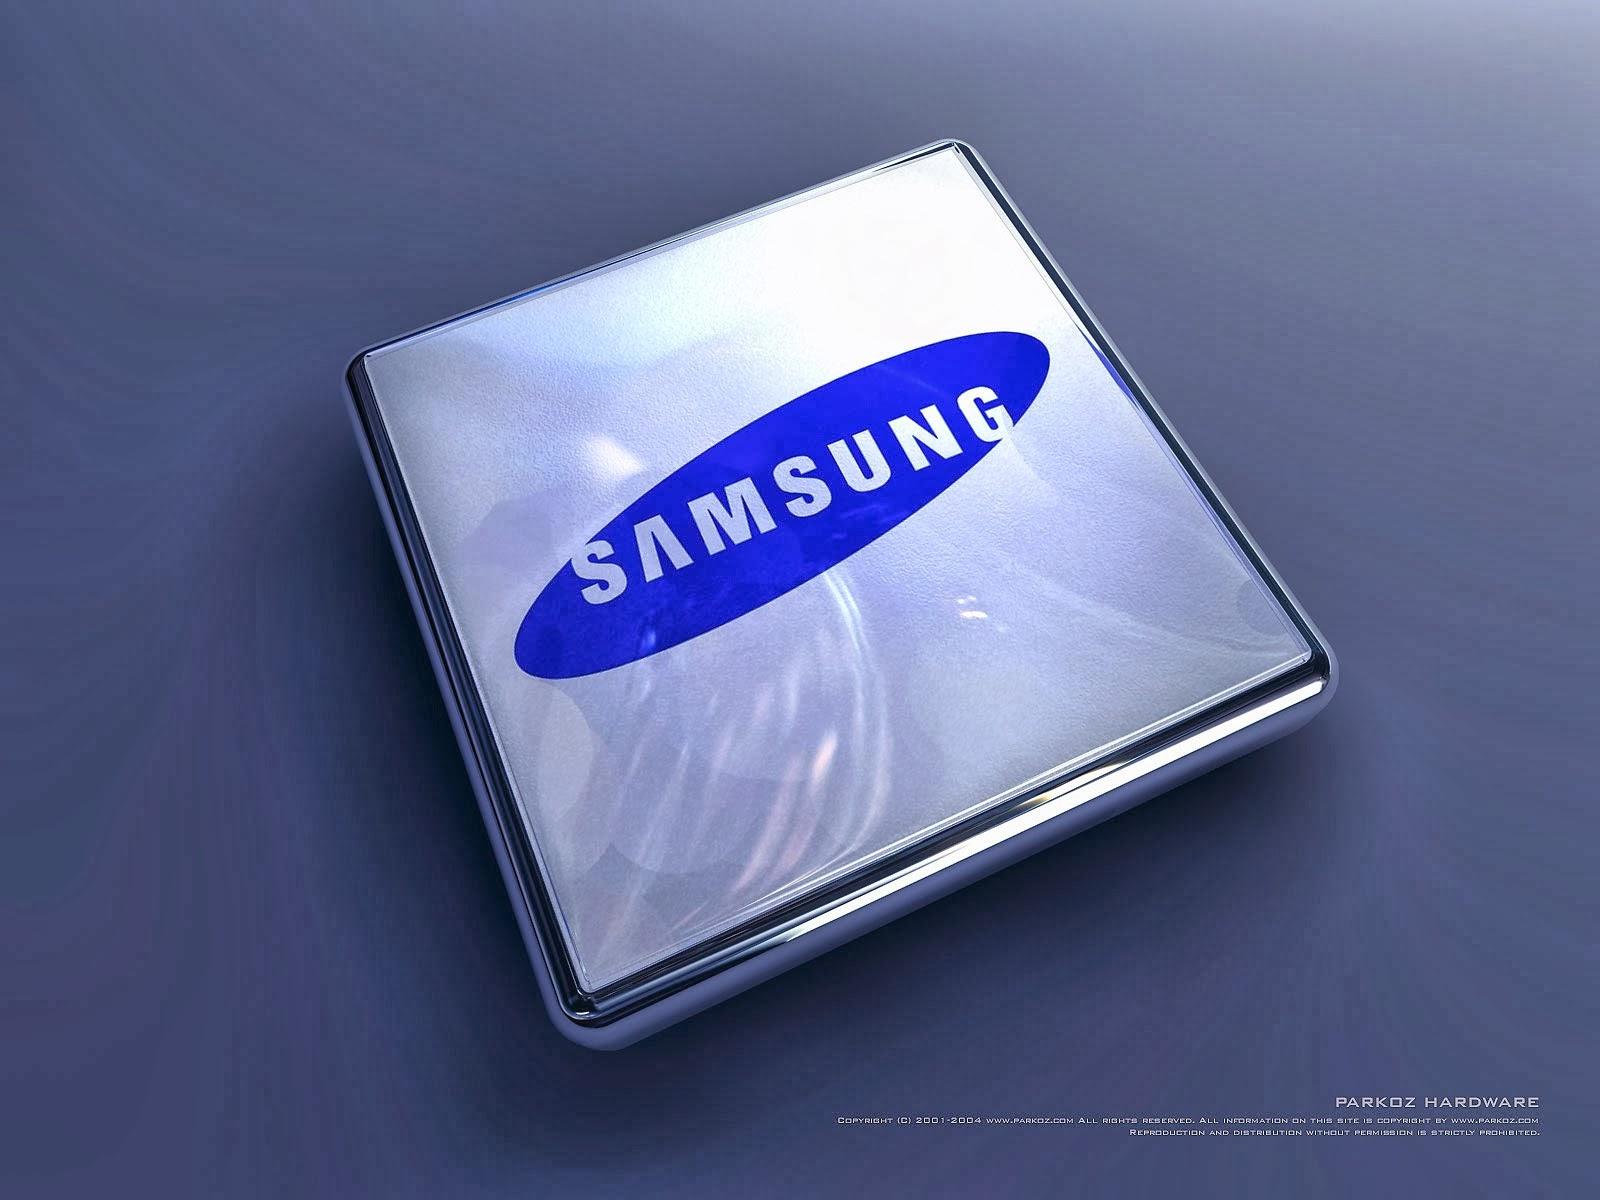 Wallpaper Hd For Desktop Background Samsung Hd Wallpapers